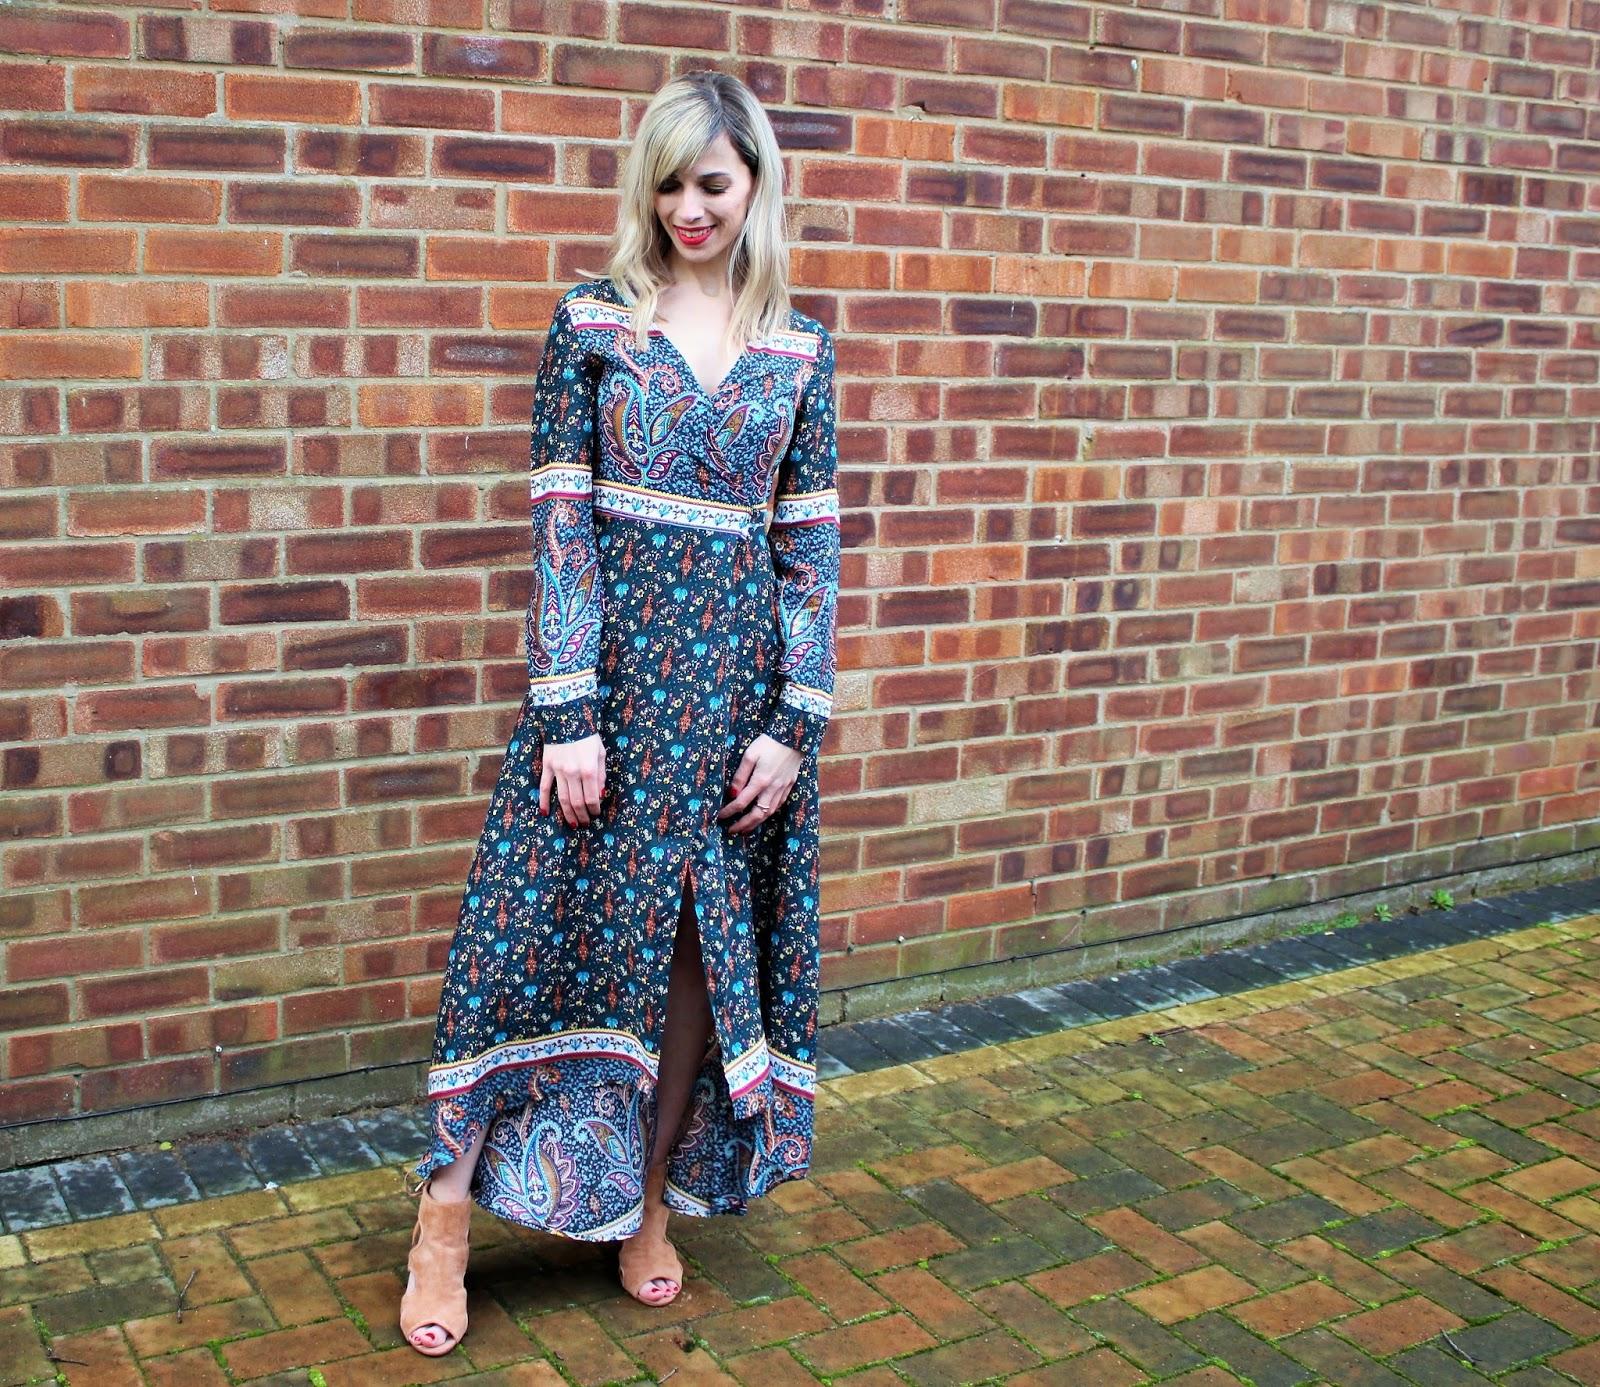 OOTD featuring a Shein wraparound maxi dress - 2